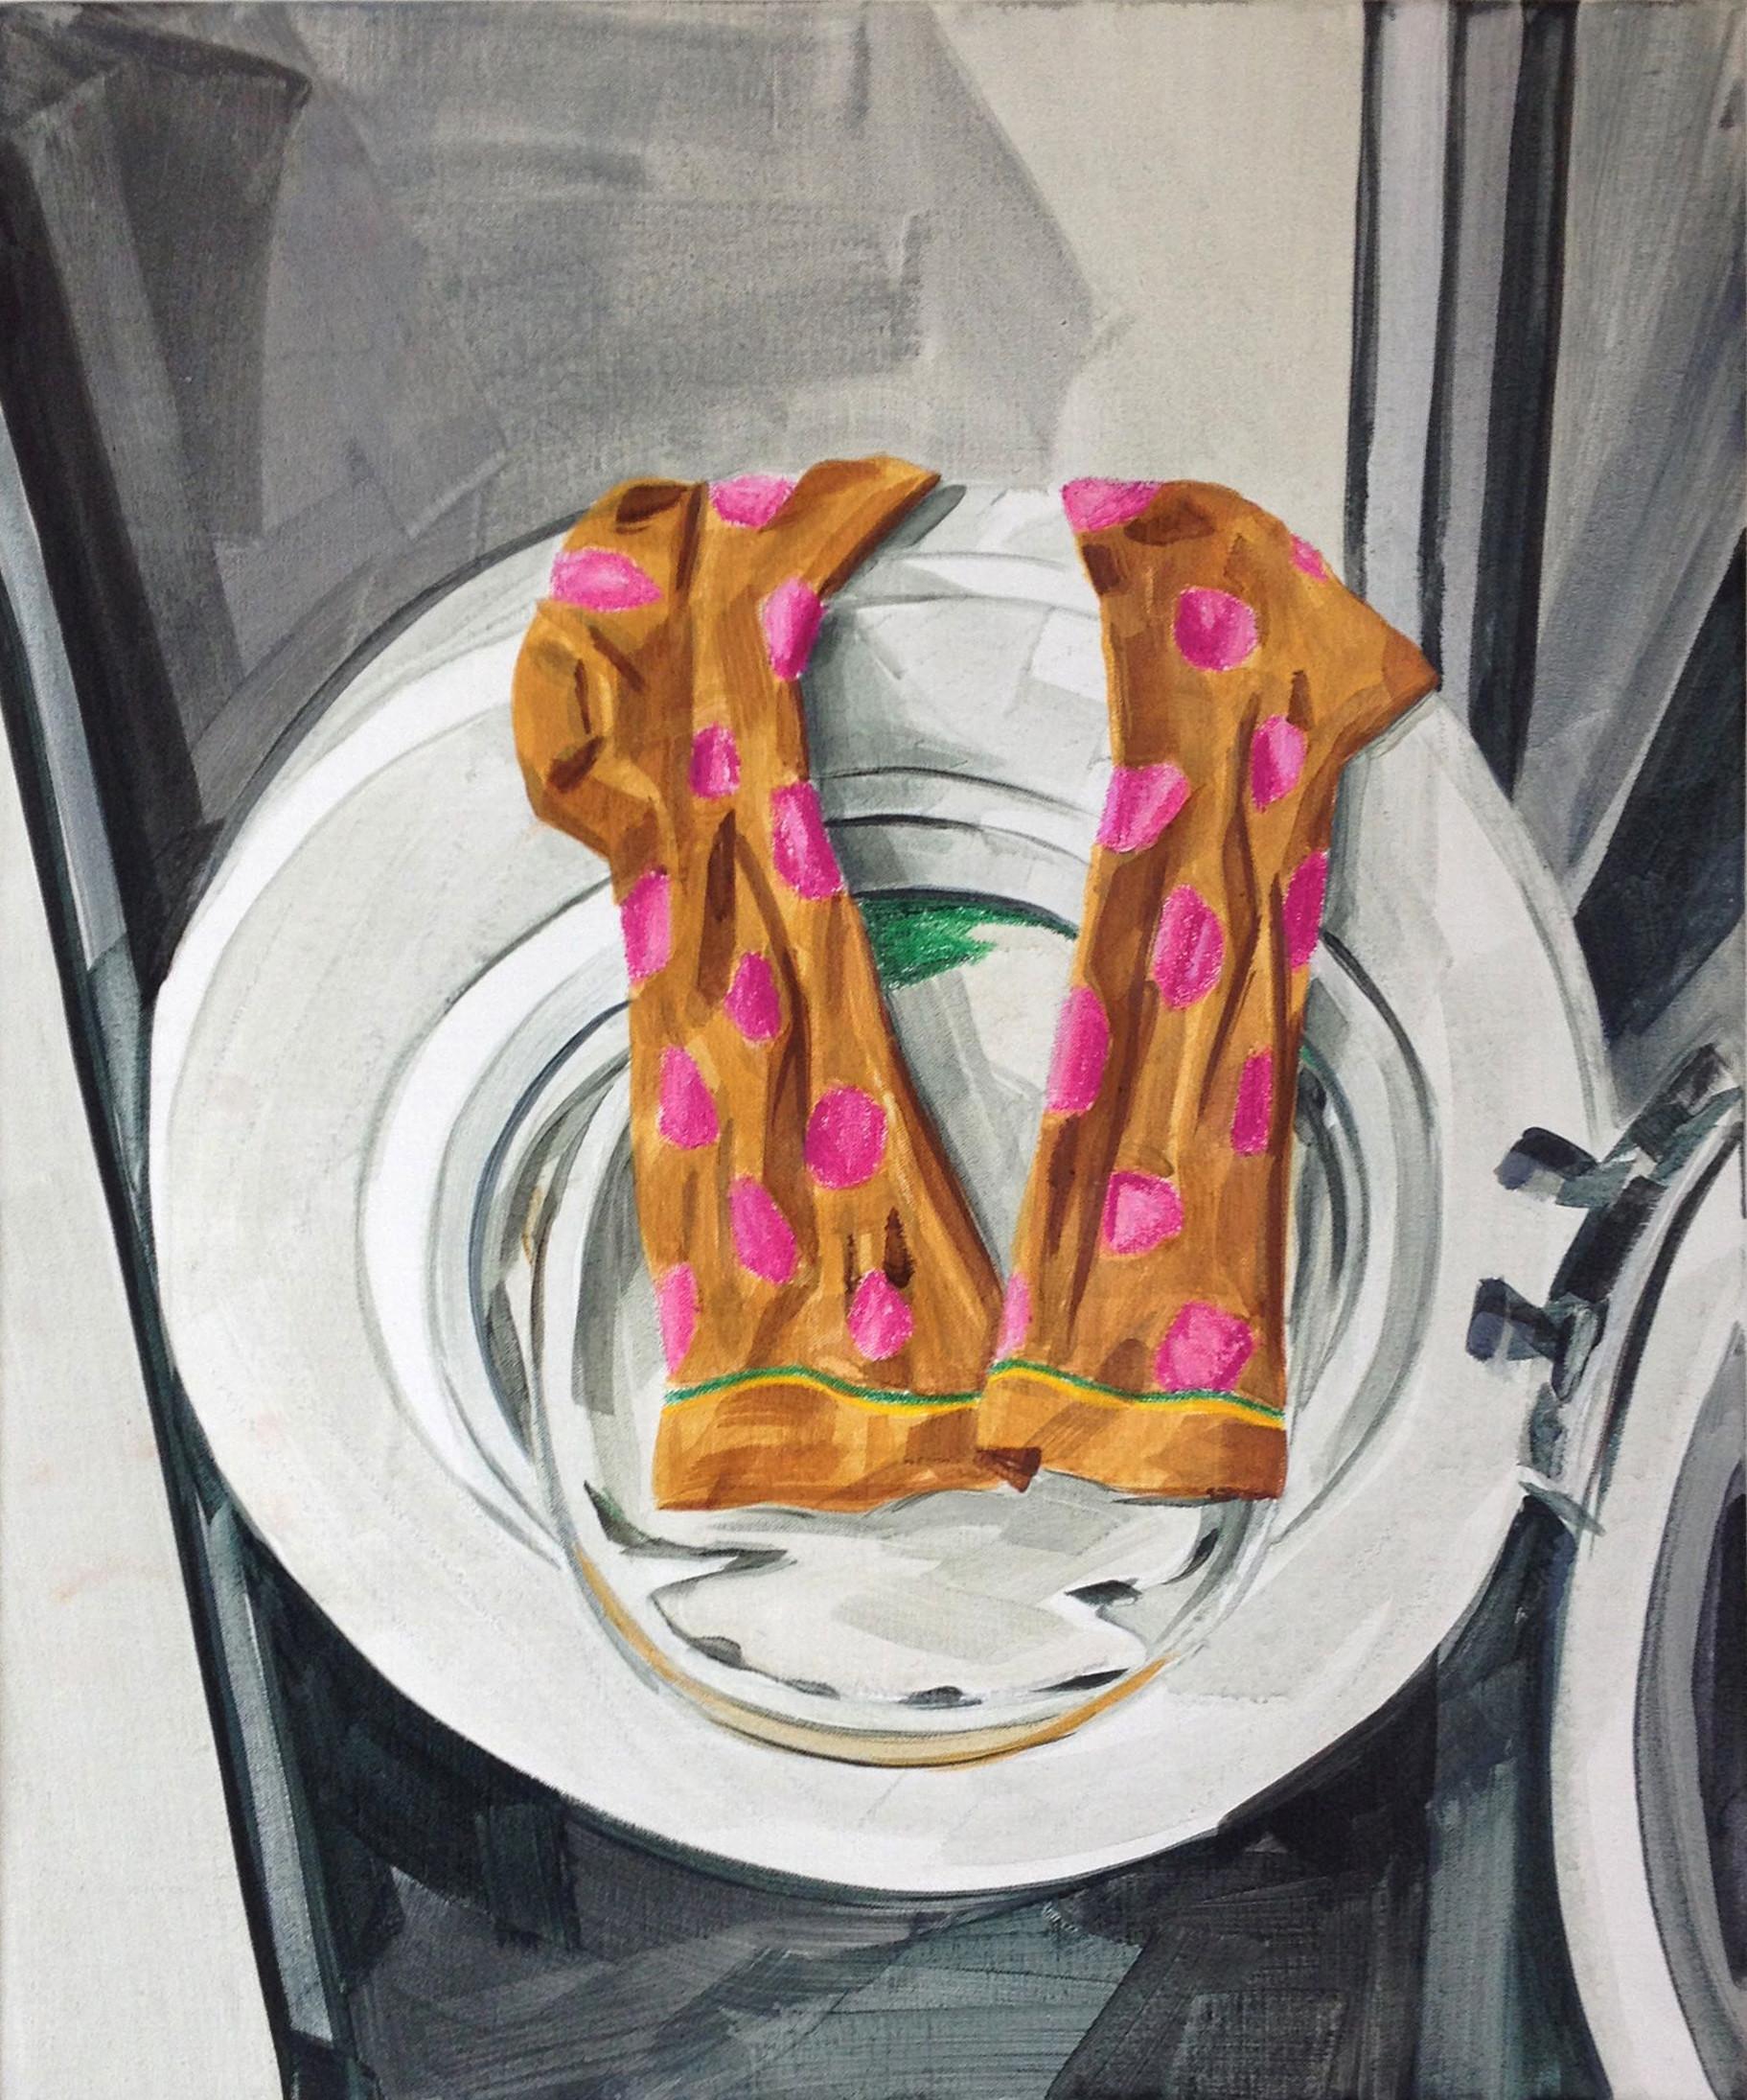 Britt Dorenbosch sokken wasmachine bonne maison